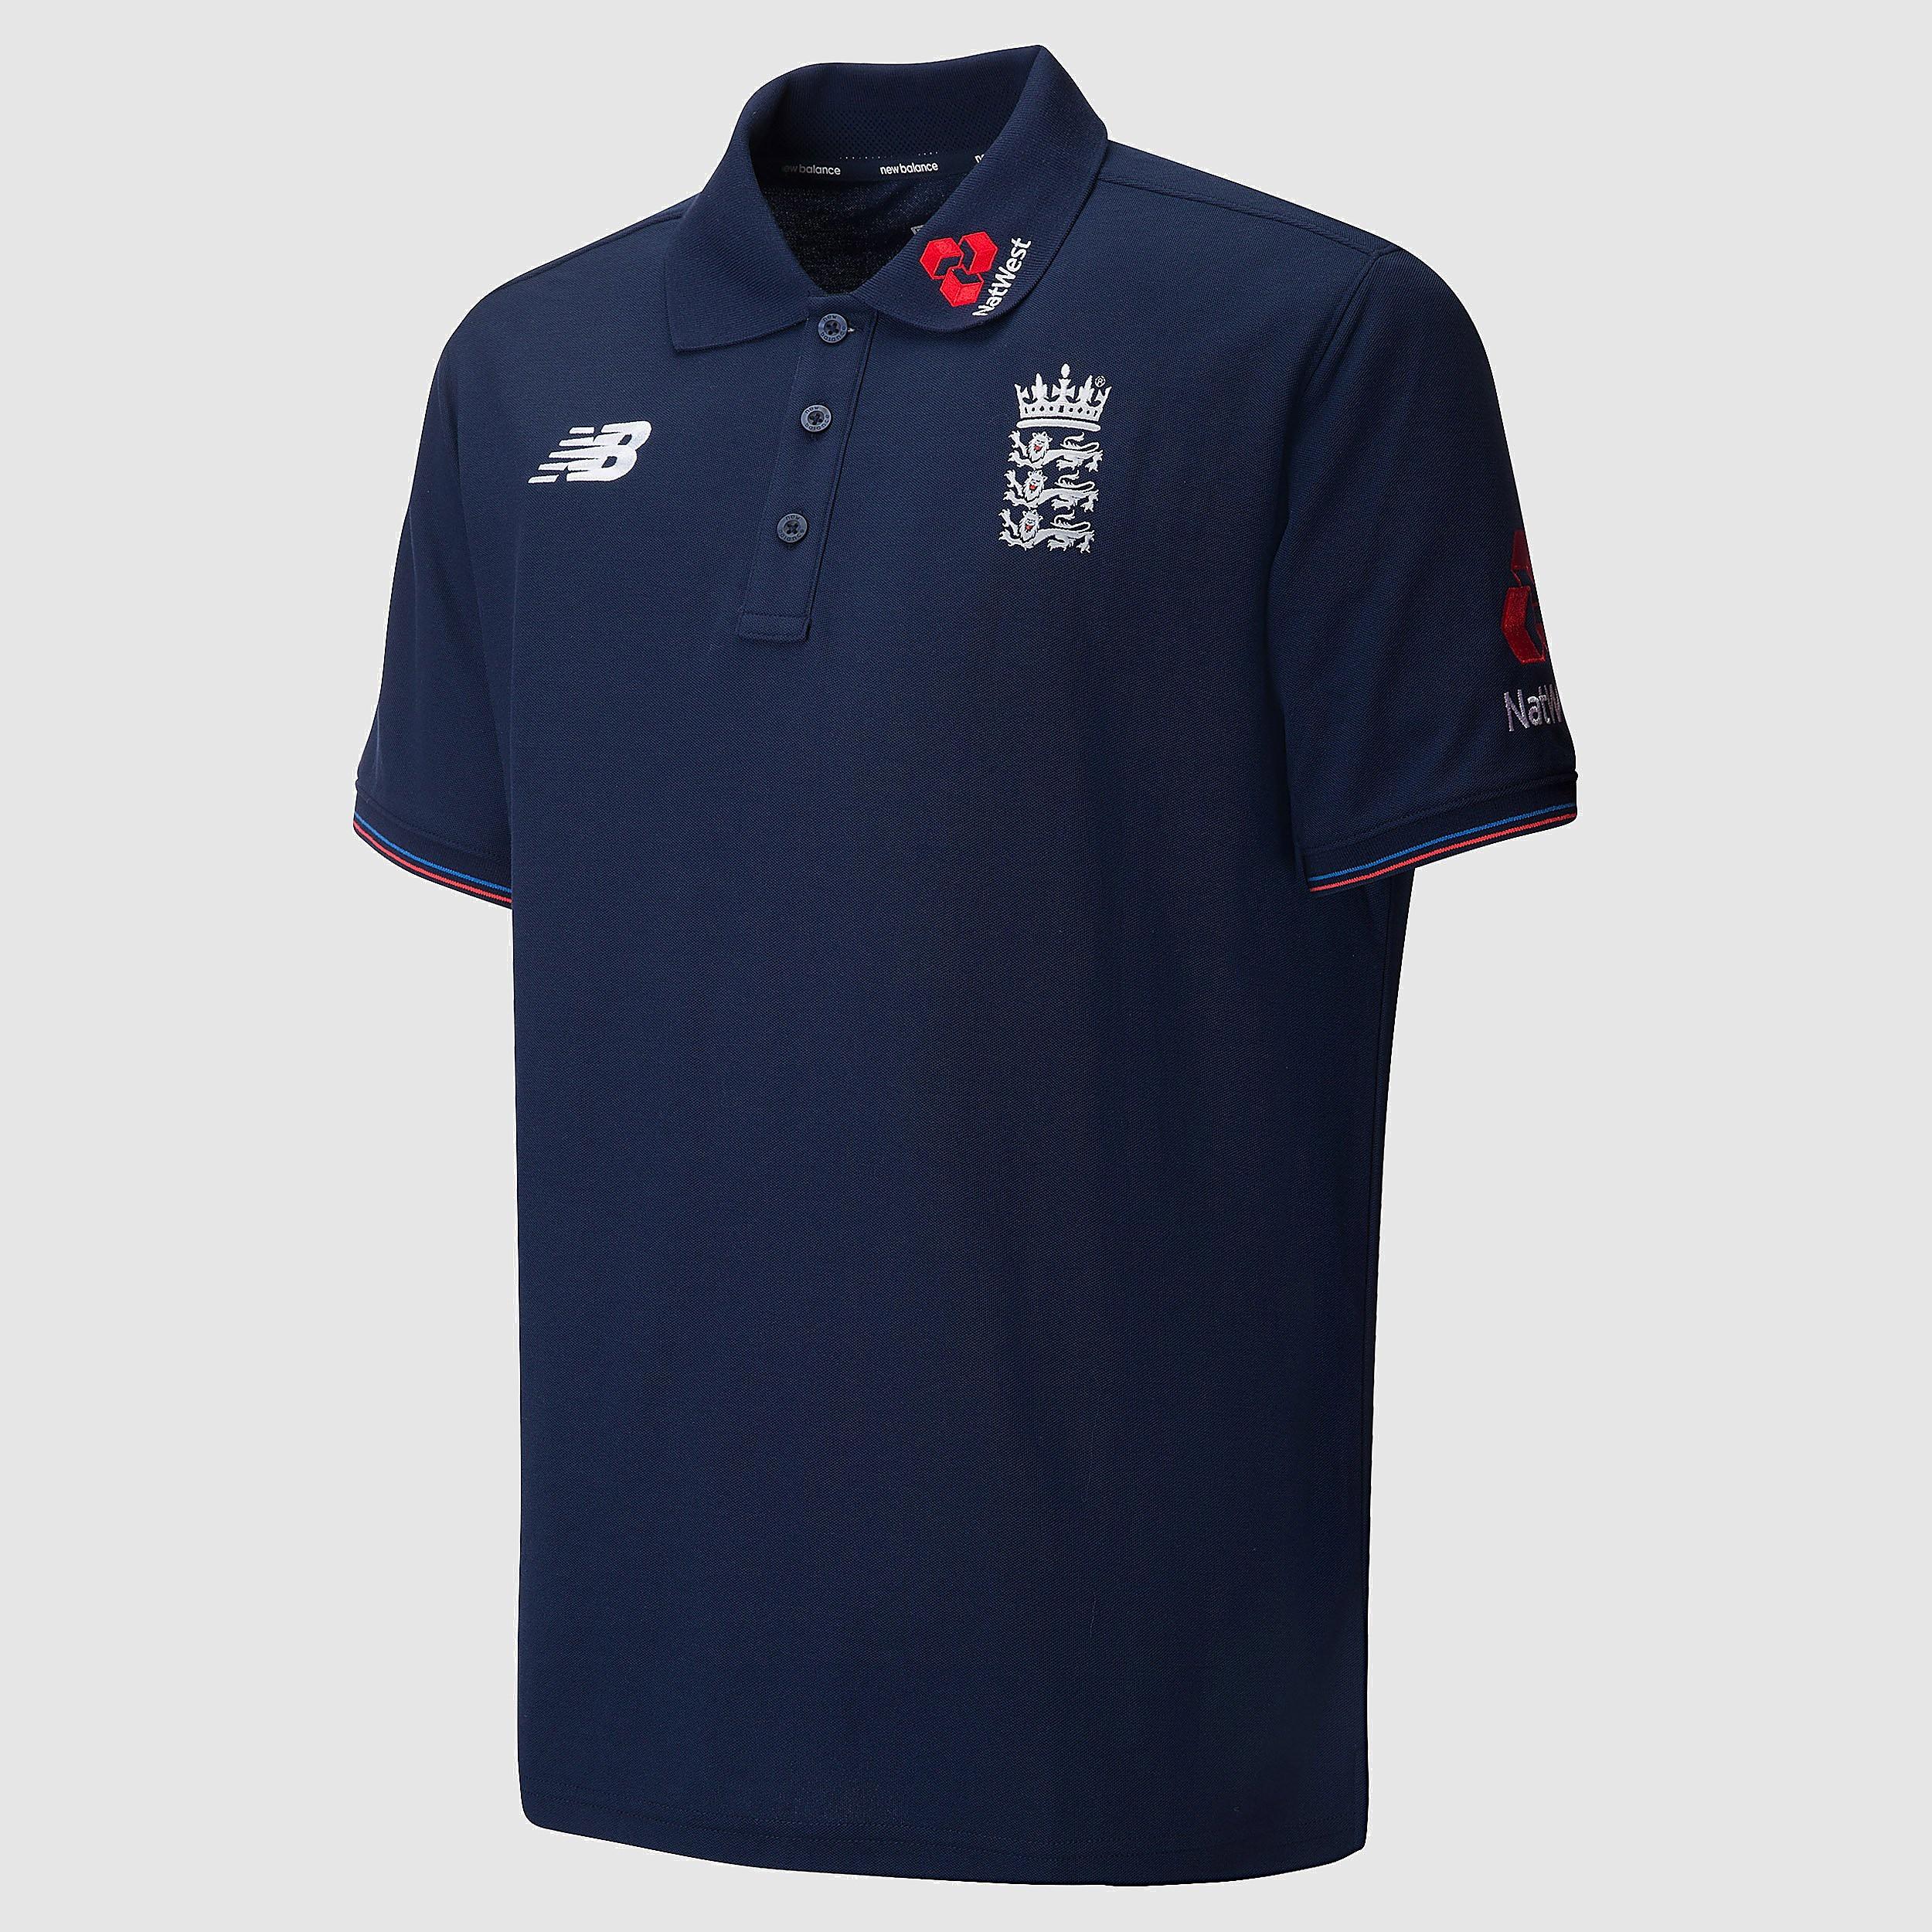 New Balance ECB Men's Polo Shirt